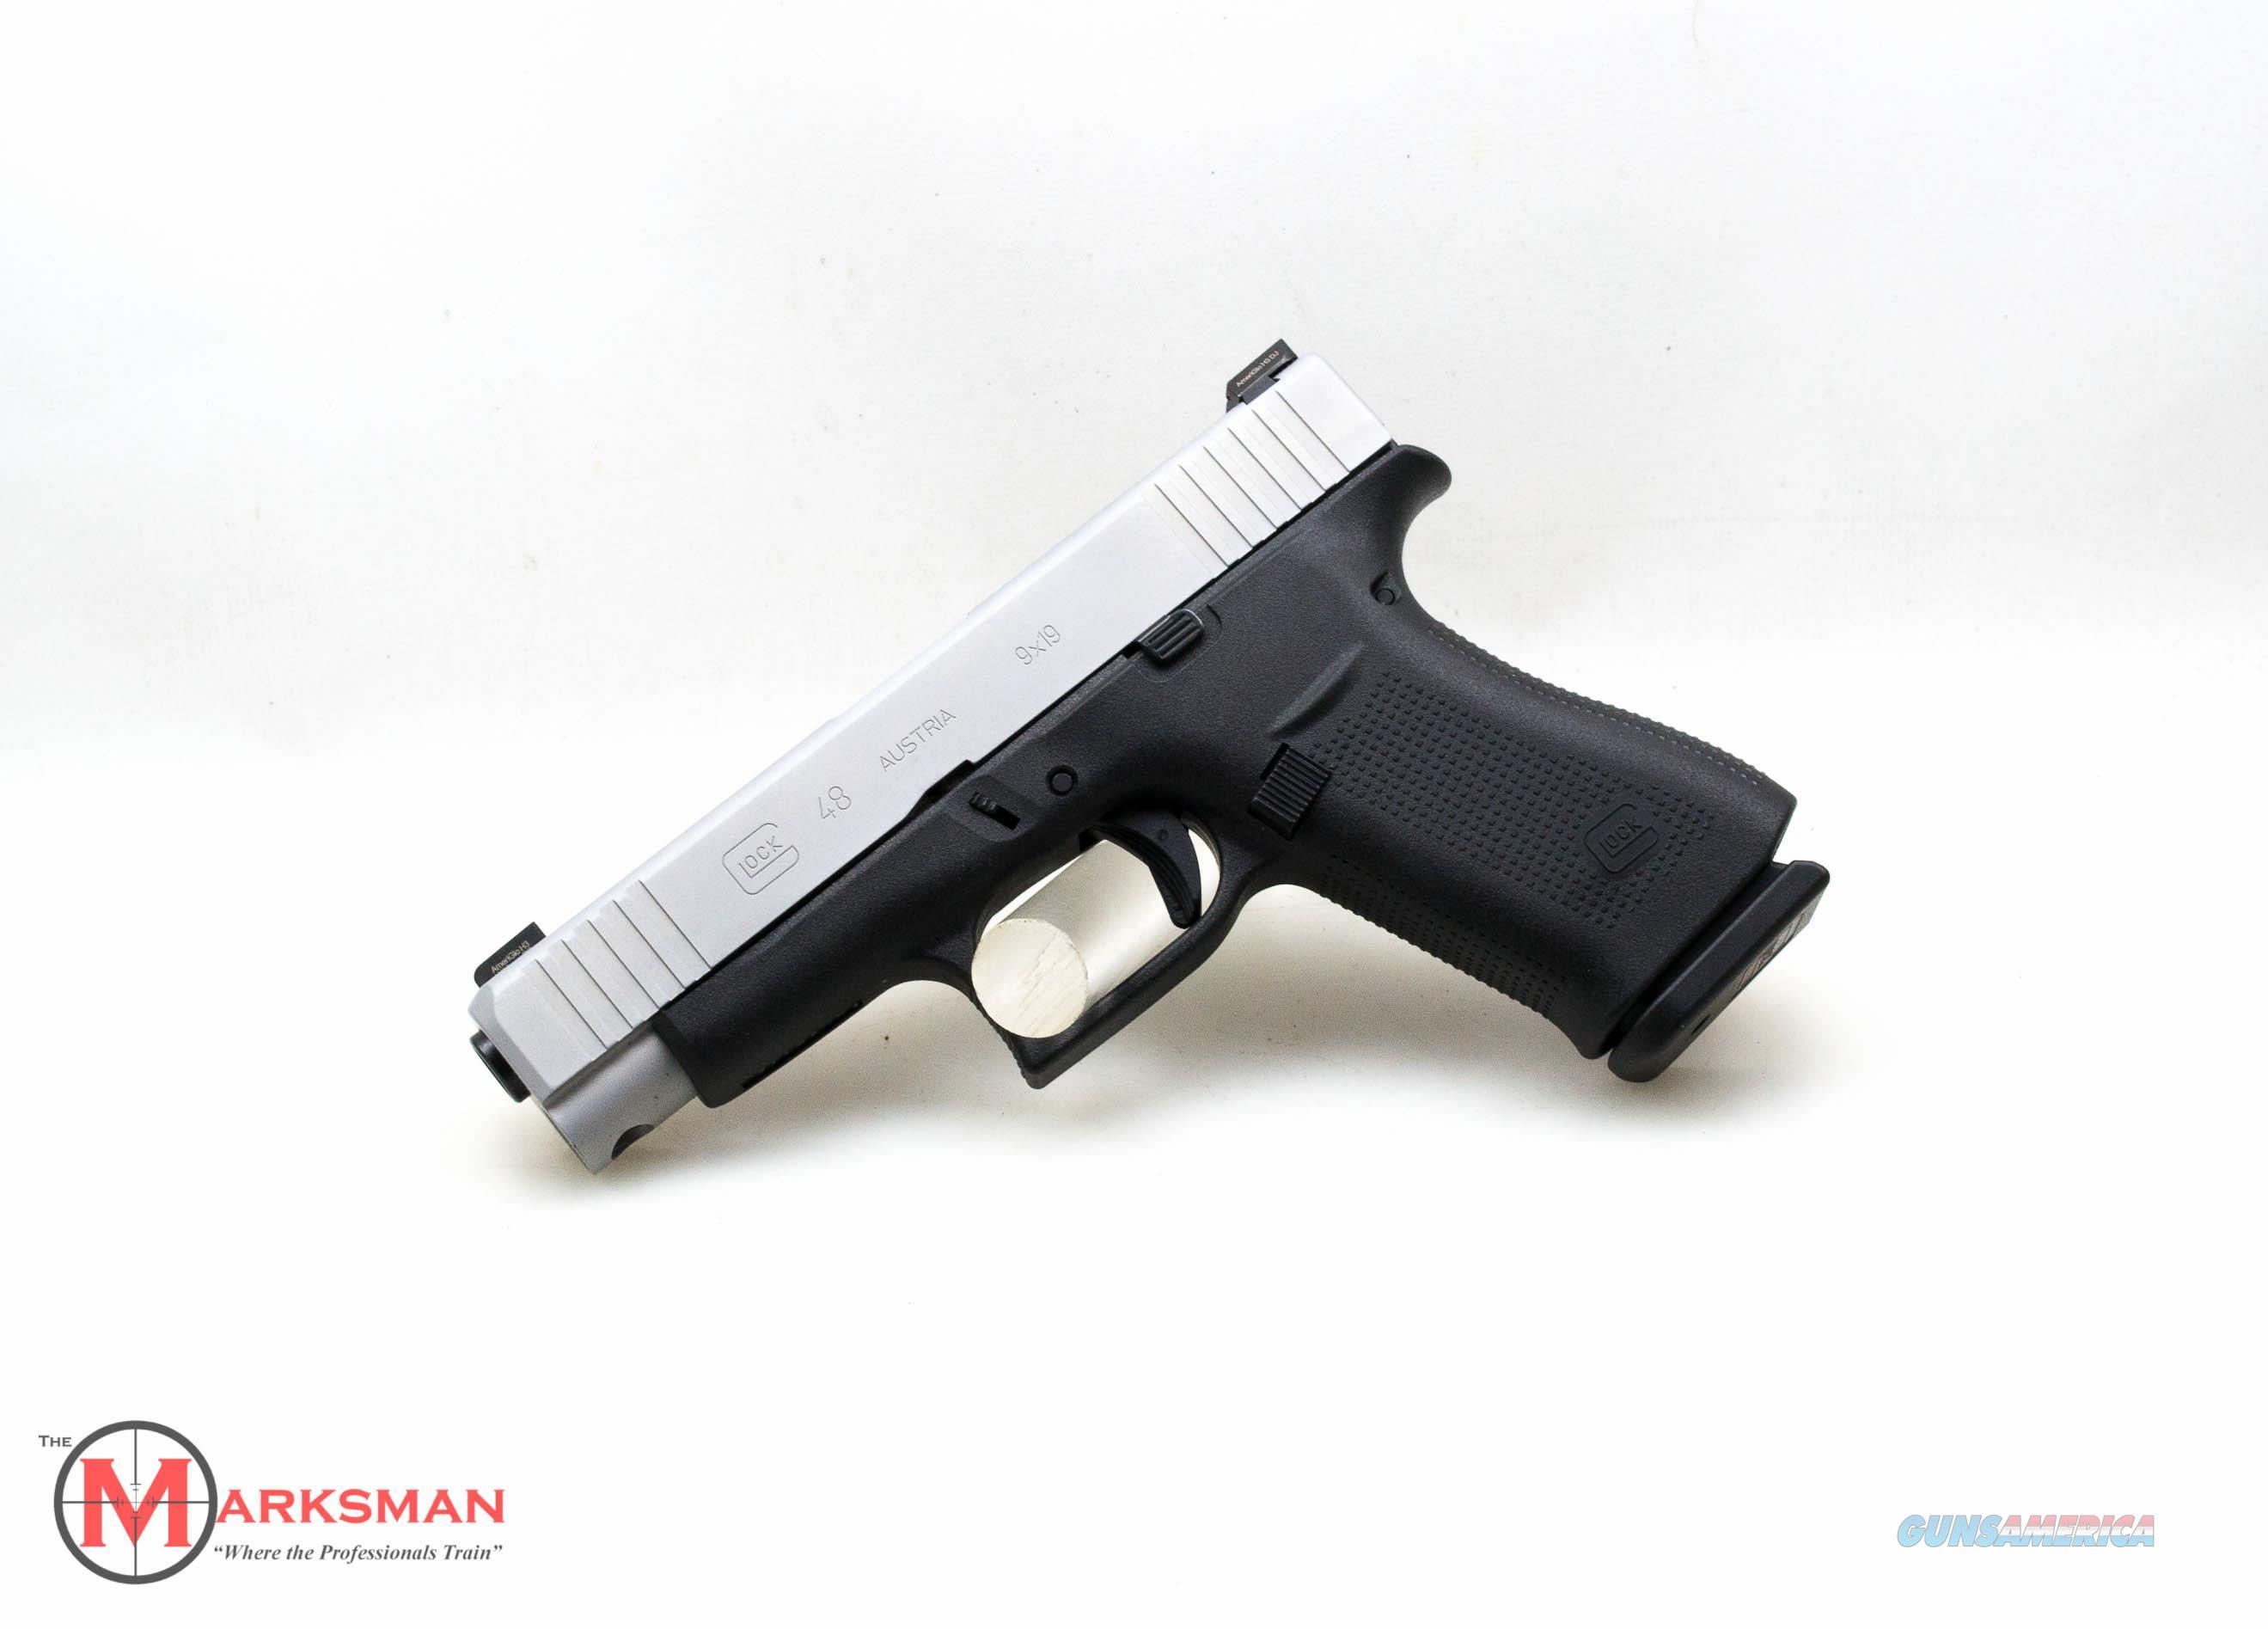 Glock 48, 9mm, Ameriglo Bold Tritium Sights NEW  Guns > Pistols > Glock Pistols > 43